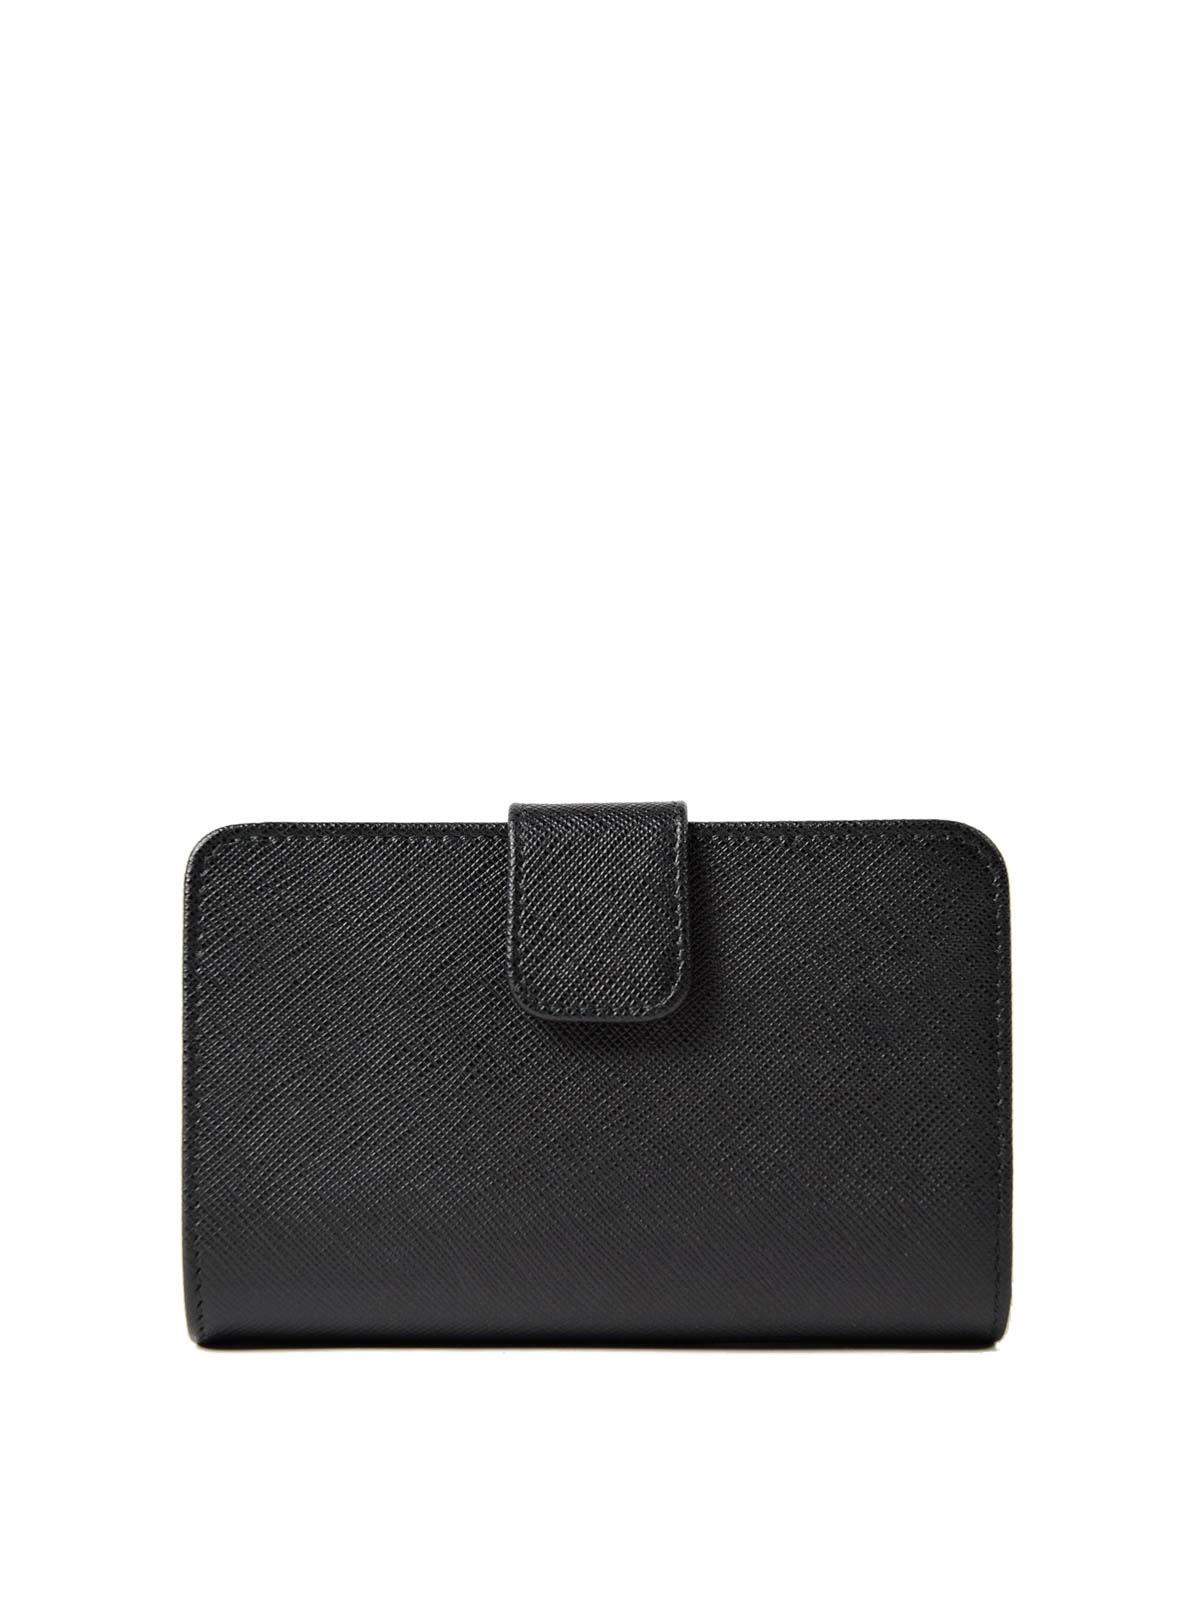 ddffc09067b8 iKRIX PRADA  wallets   purses - Black saffiano leather French wallet